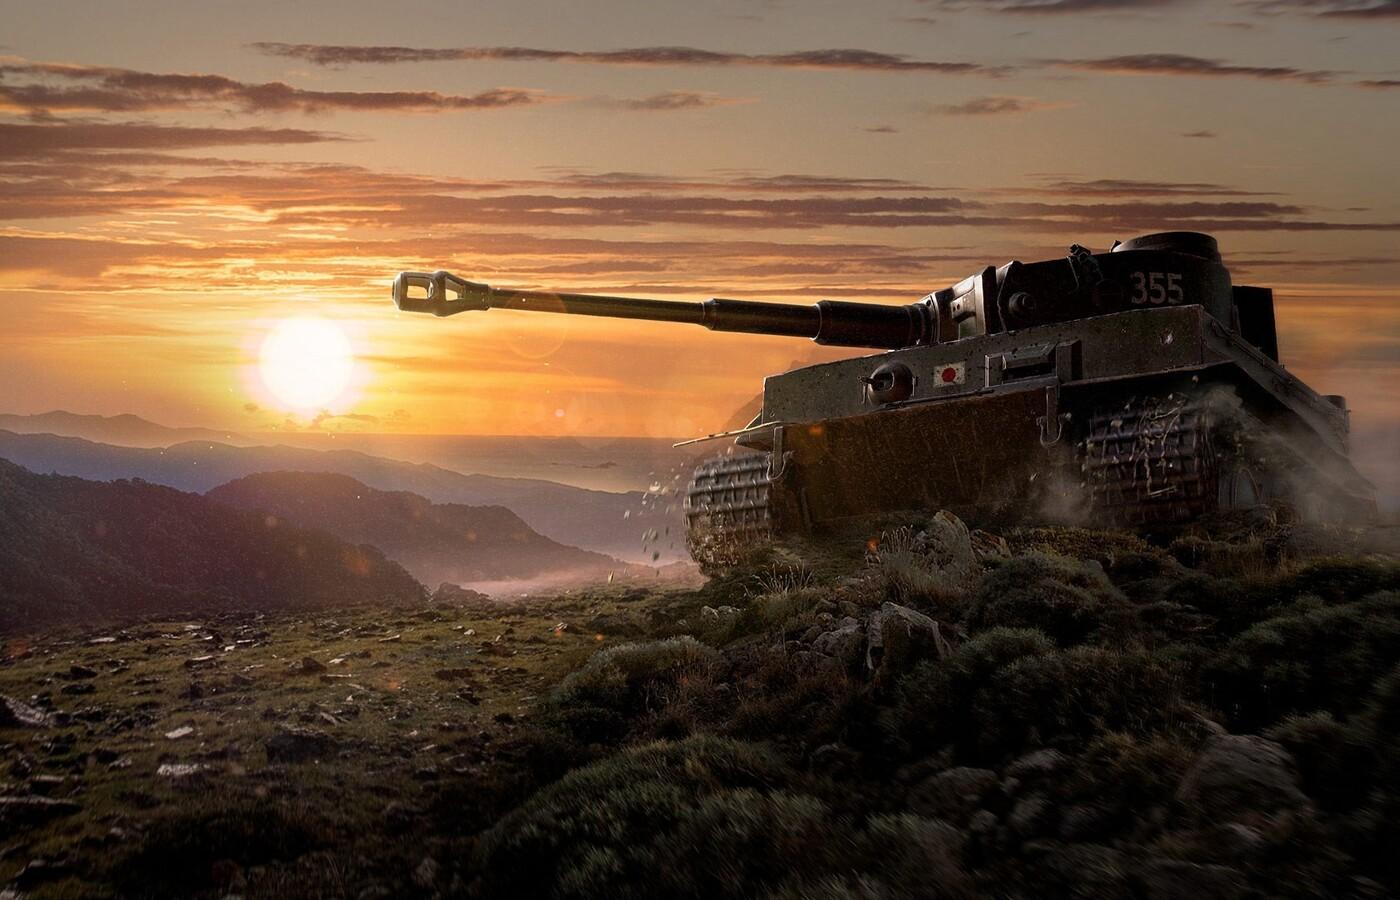 world-of-tanks-video-game-qhd.jpg